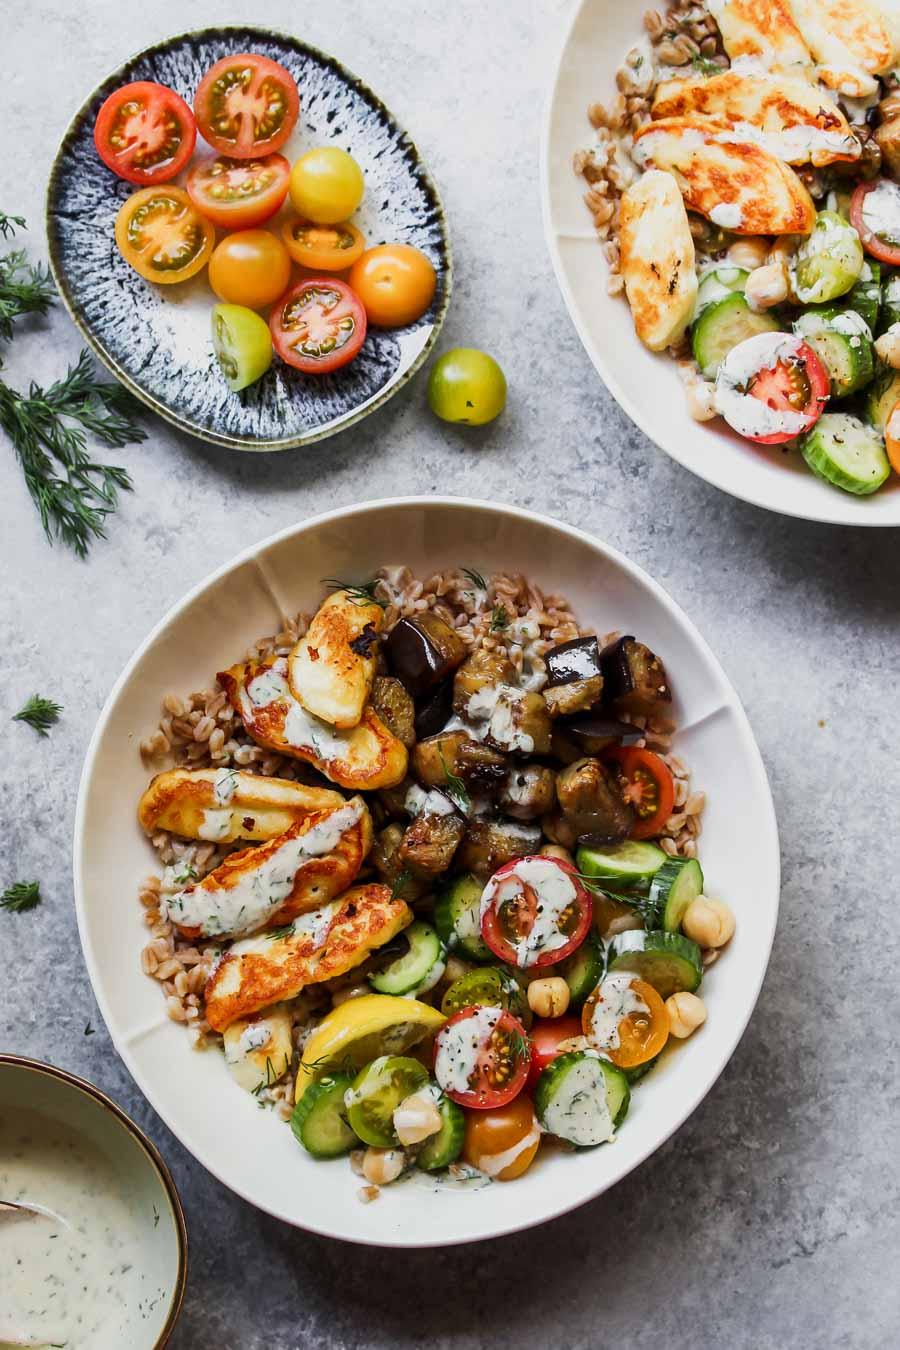 Mediterranean Eggplant and Halloumi Bowls with Lemon-Dill Sauce